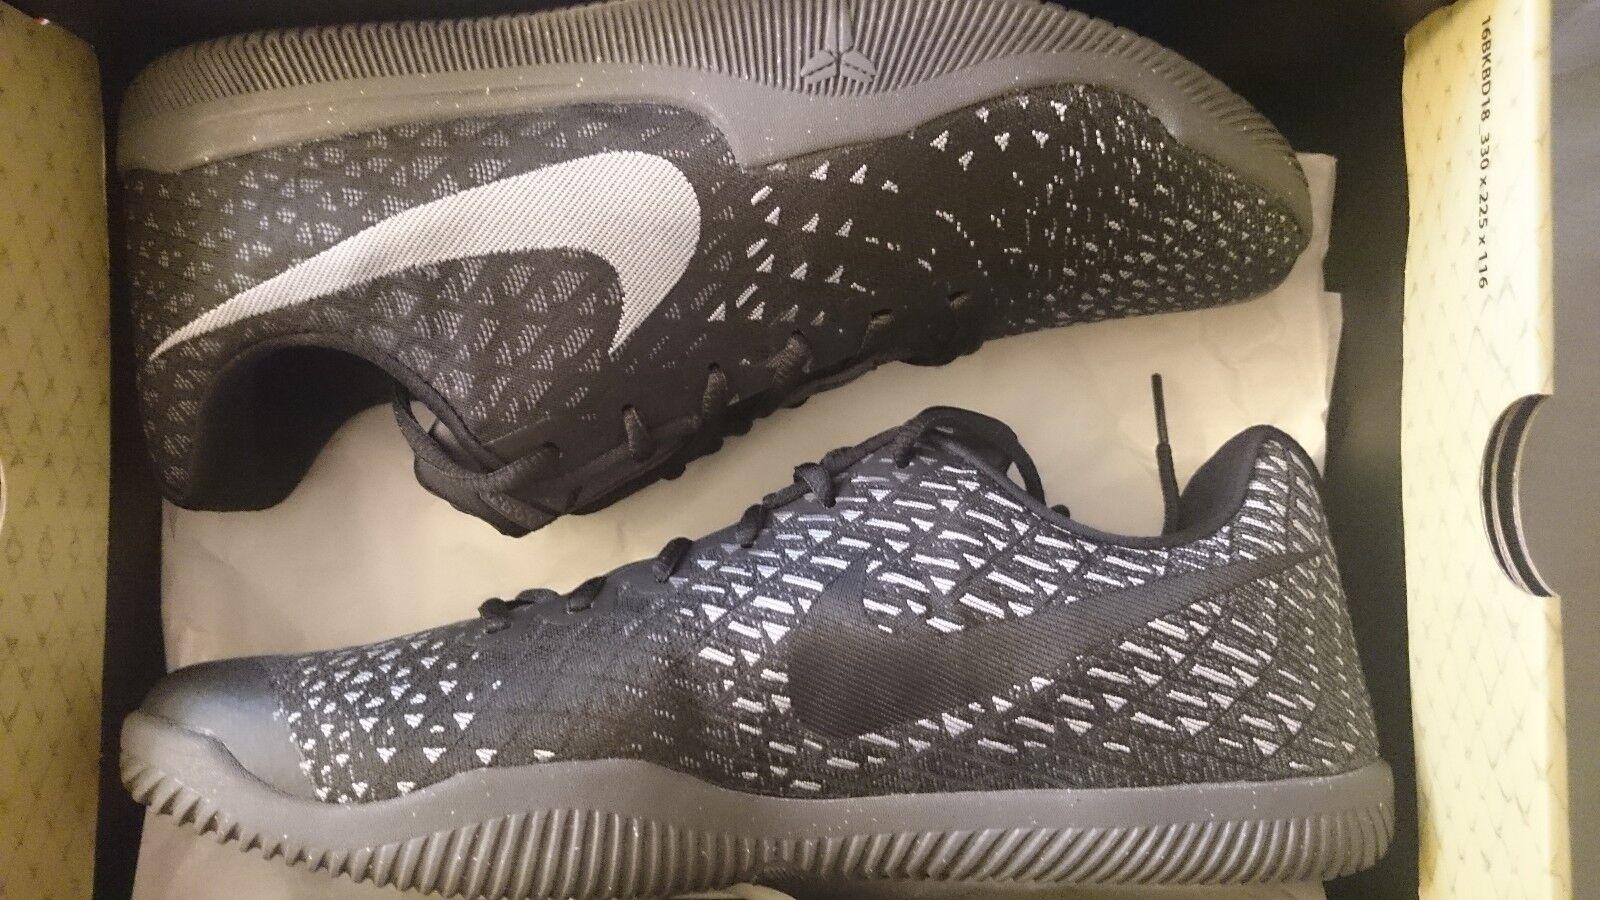 Nike Kobe Mamba Instinct black anthracite men's basketball shoe 852473 001 NEW